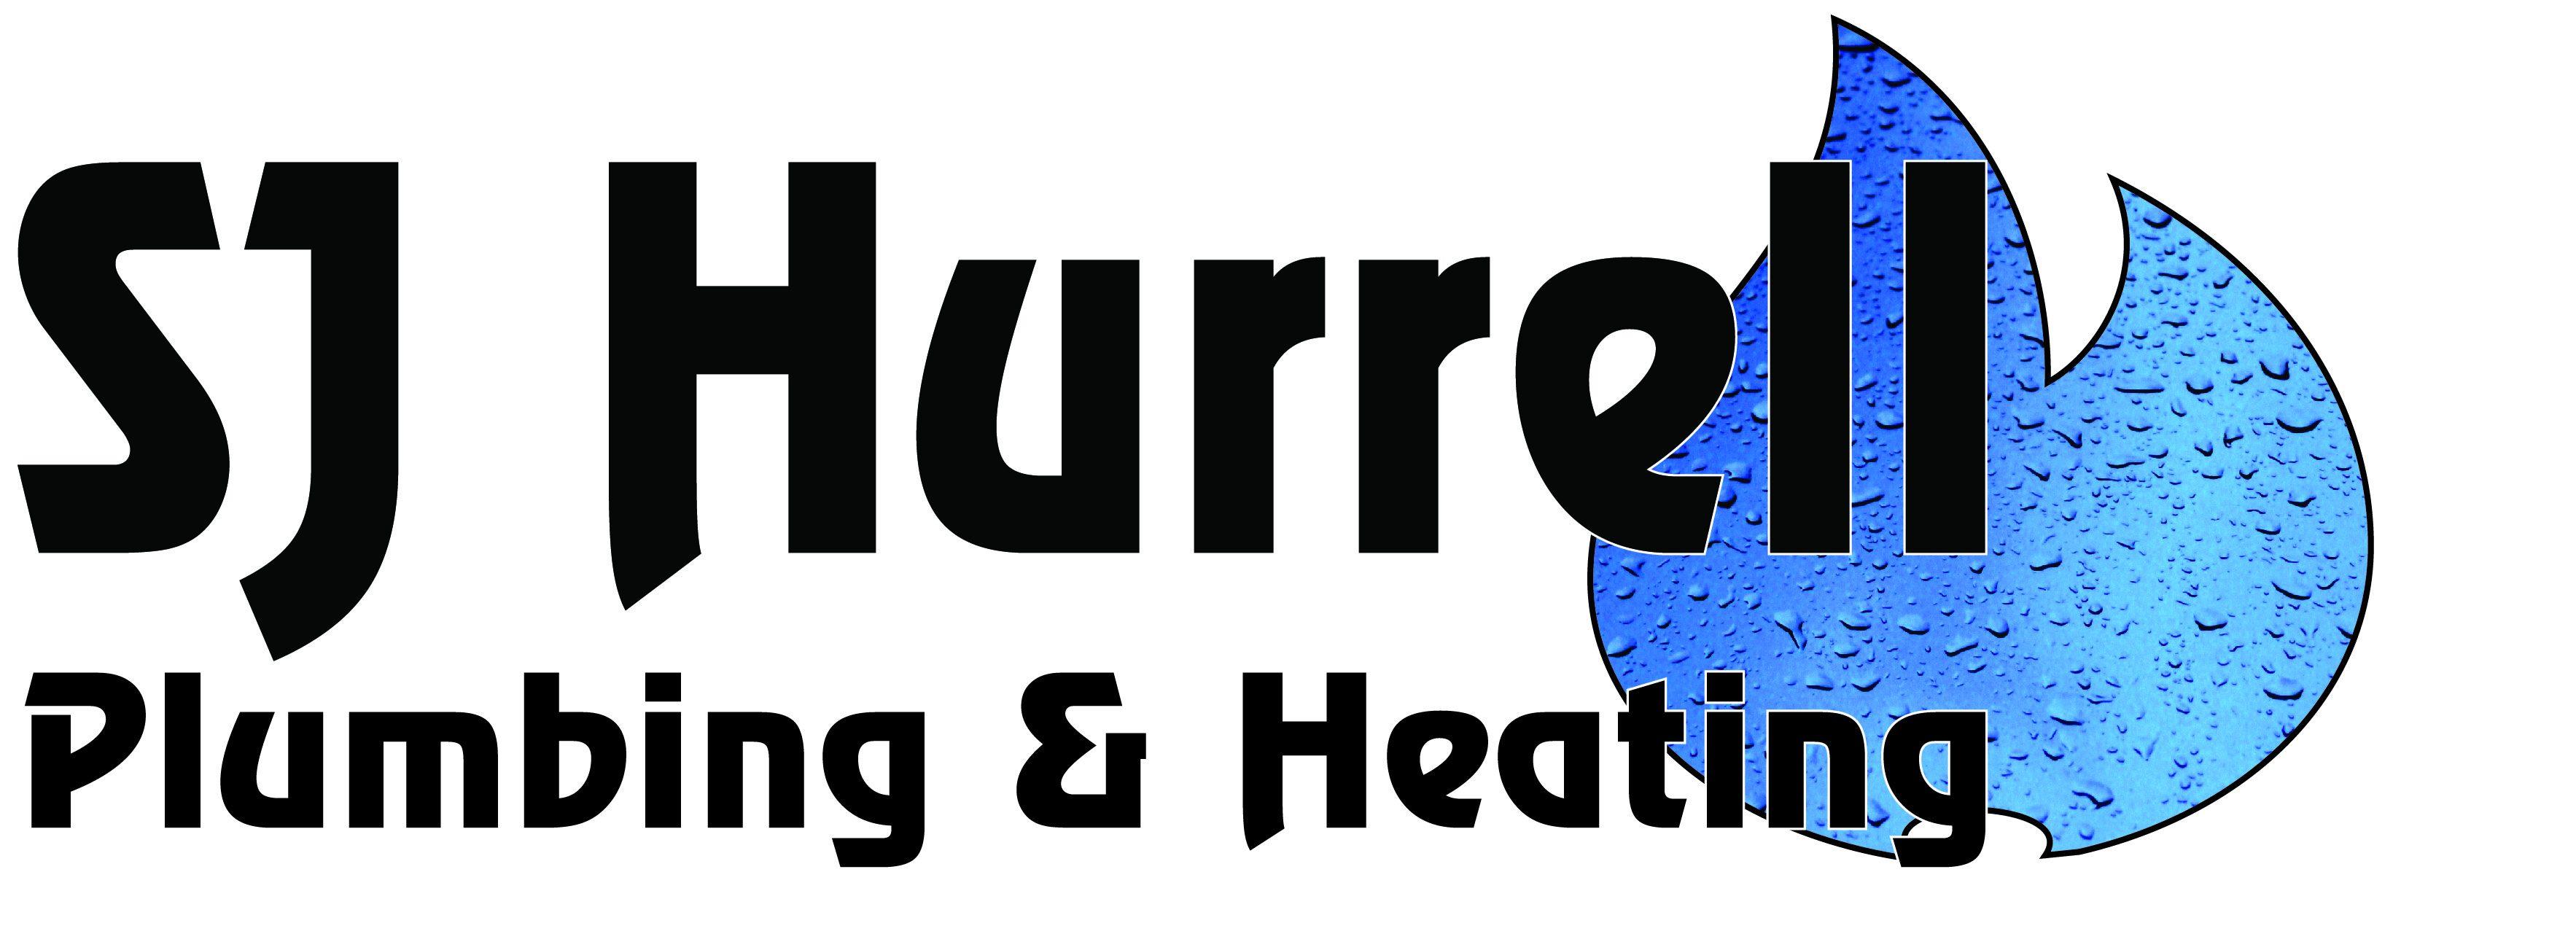 SJ Hurrell Plumbing & Heating